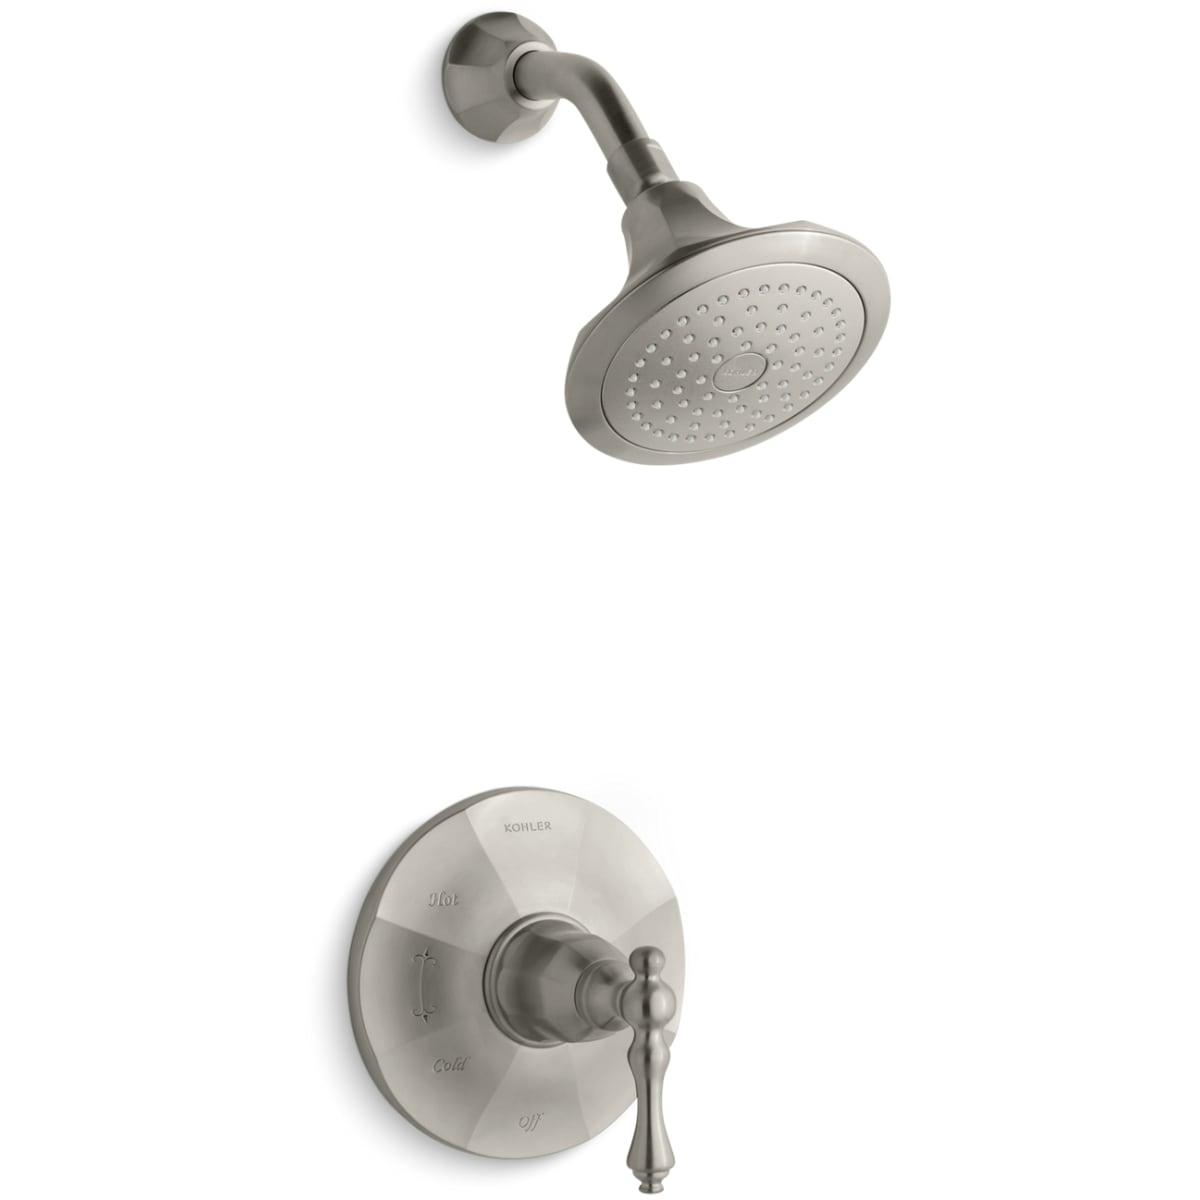 Brushed Nickel Kohler Shower Faucets.Kohler K Ts13493 4